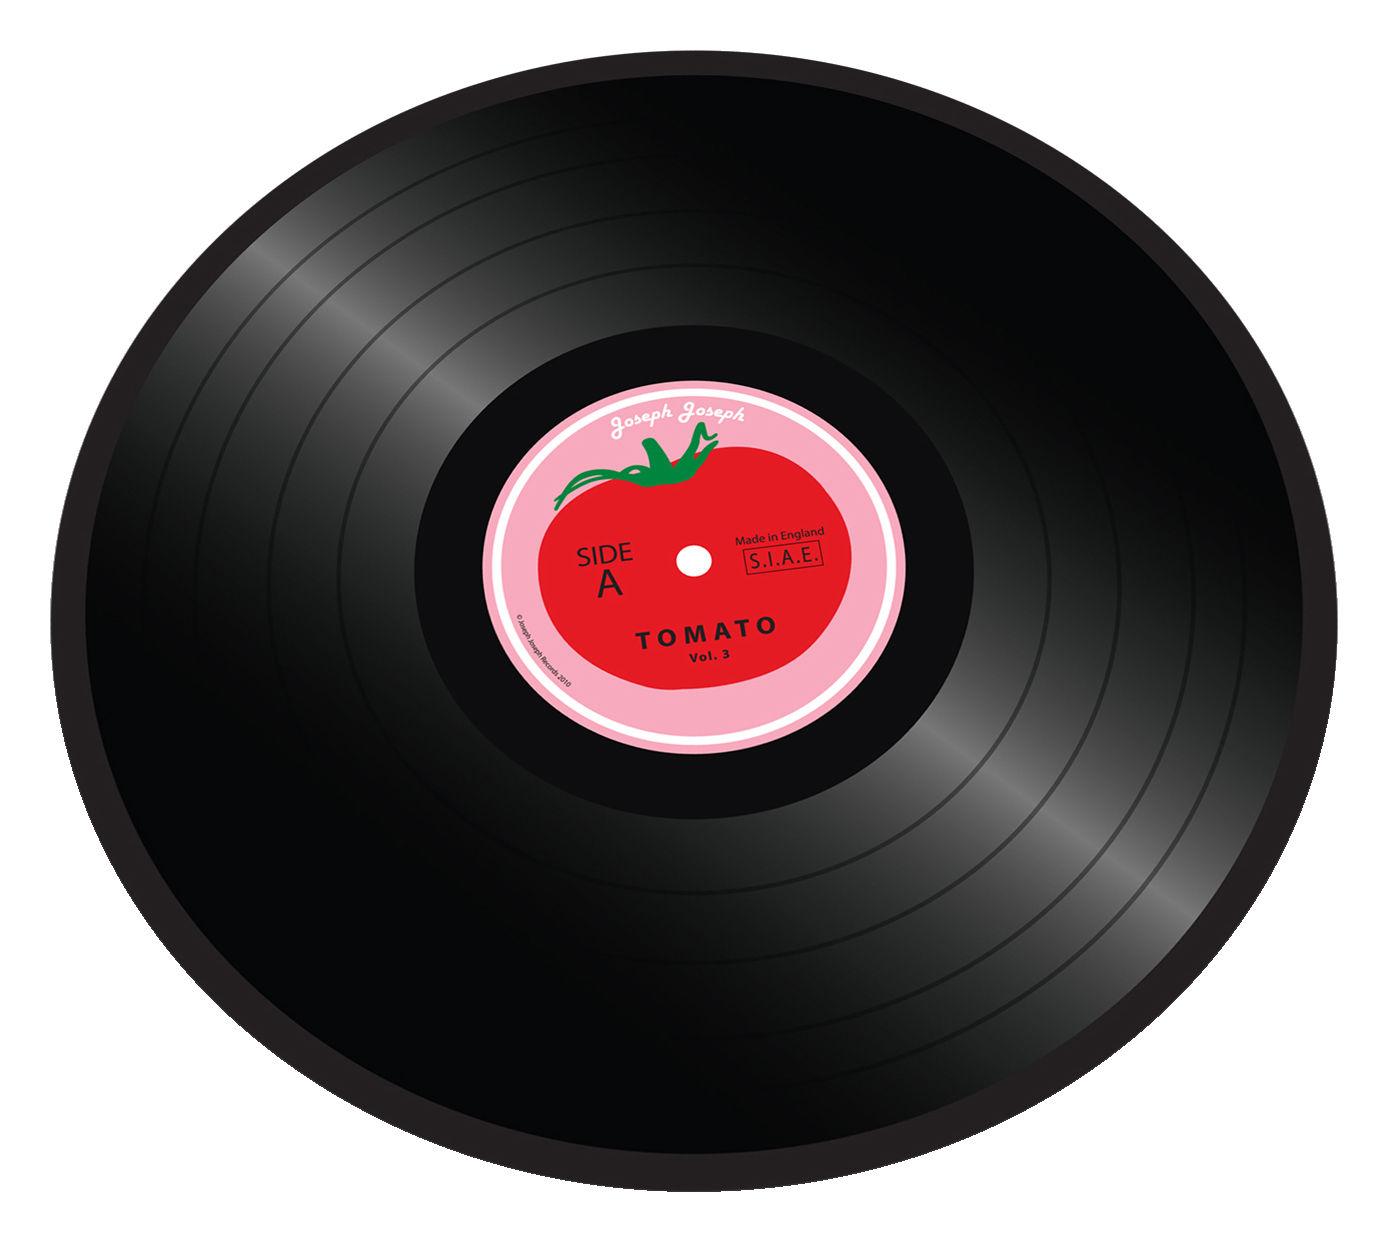 Tableware - Trays - Tomato vinyl Chopping board by Joseph Joseph - Tomato Vinyl design - Glass